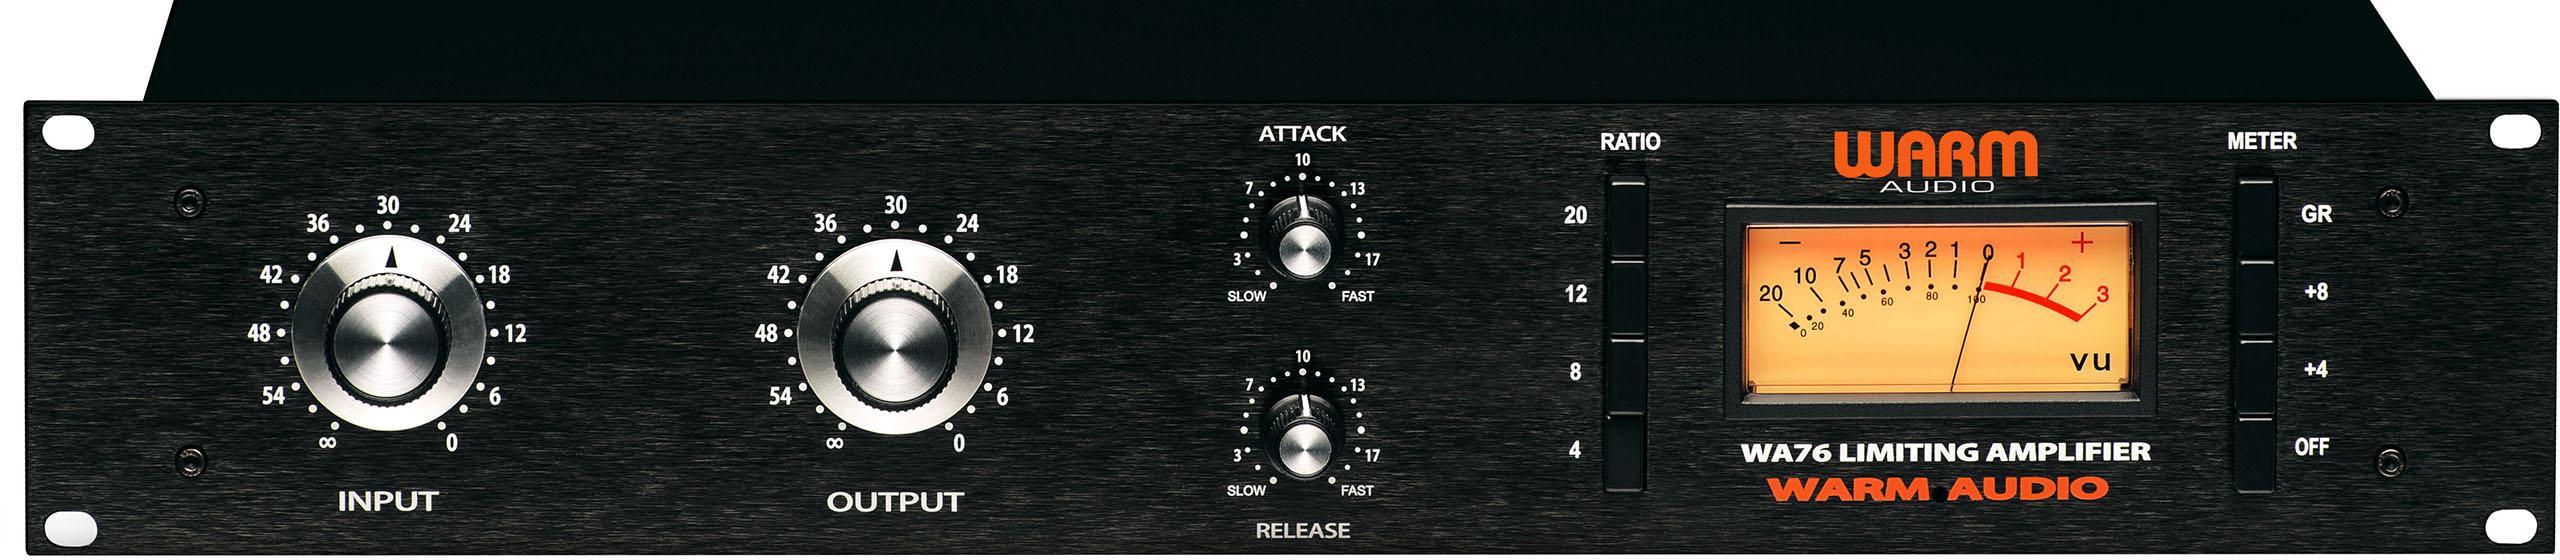 Warm Audio WA76 - 1-Channel Fet Compressor